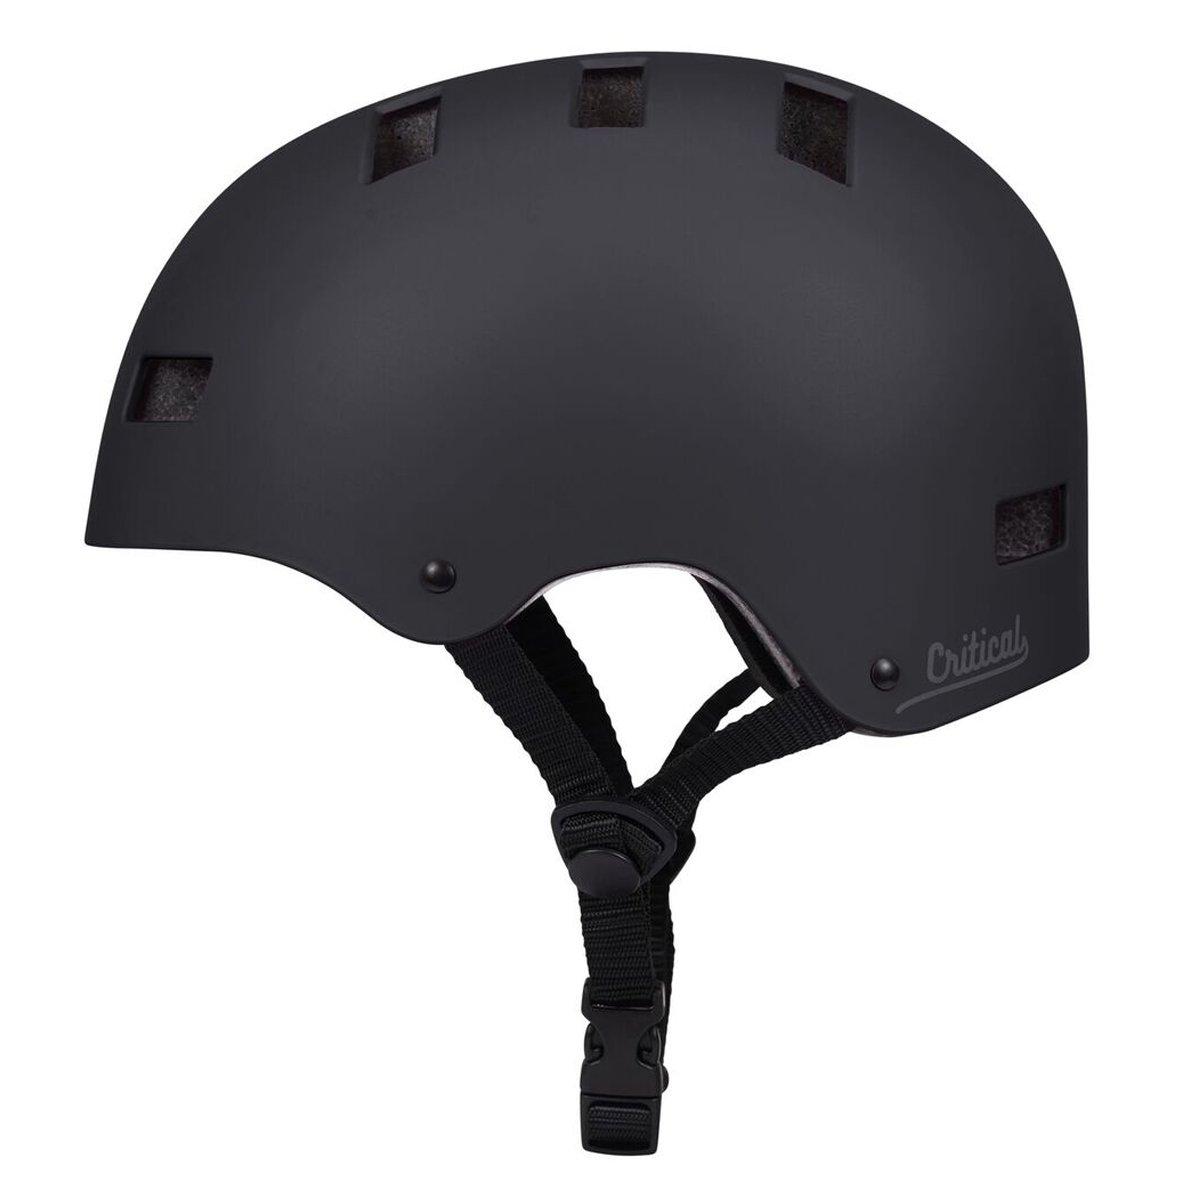 Critical Cycles Classic Commuter Bike/Skate/Multi-Sport CM-1 Helmet with 10 Vents, Matte Black,